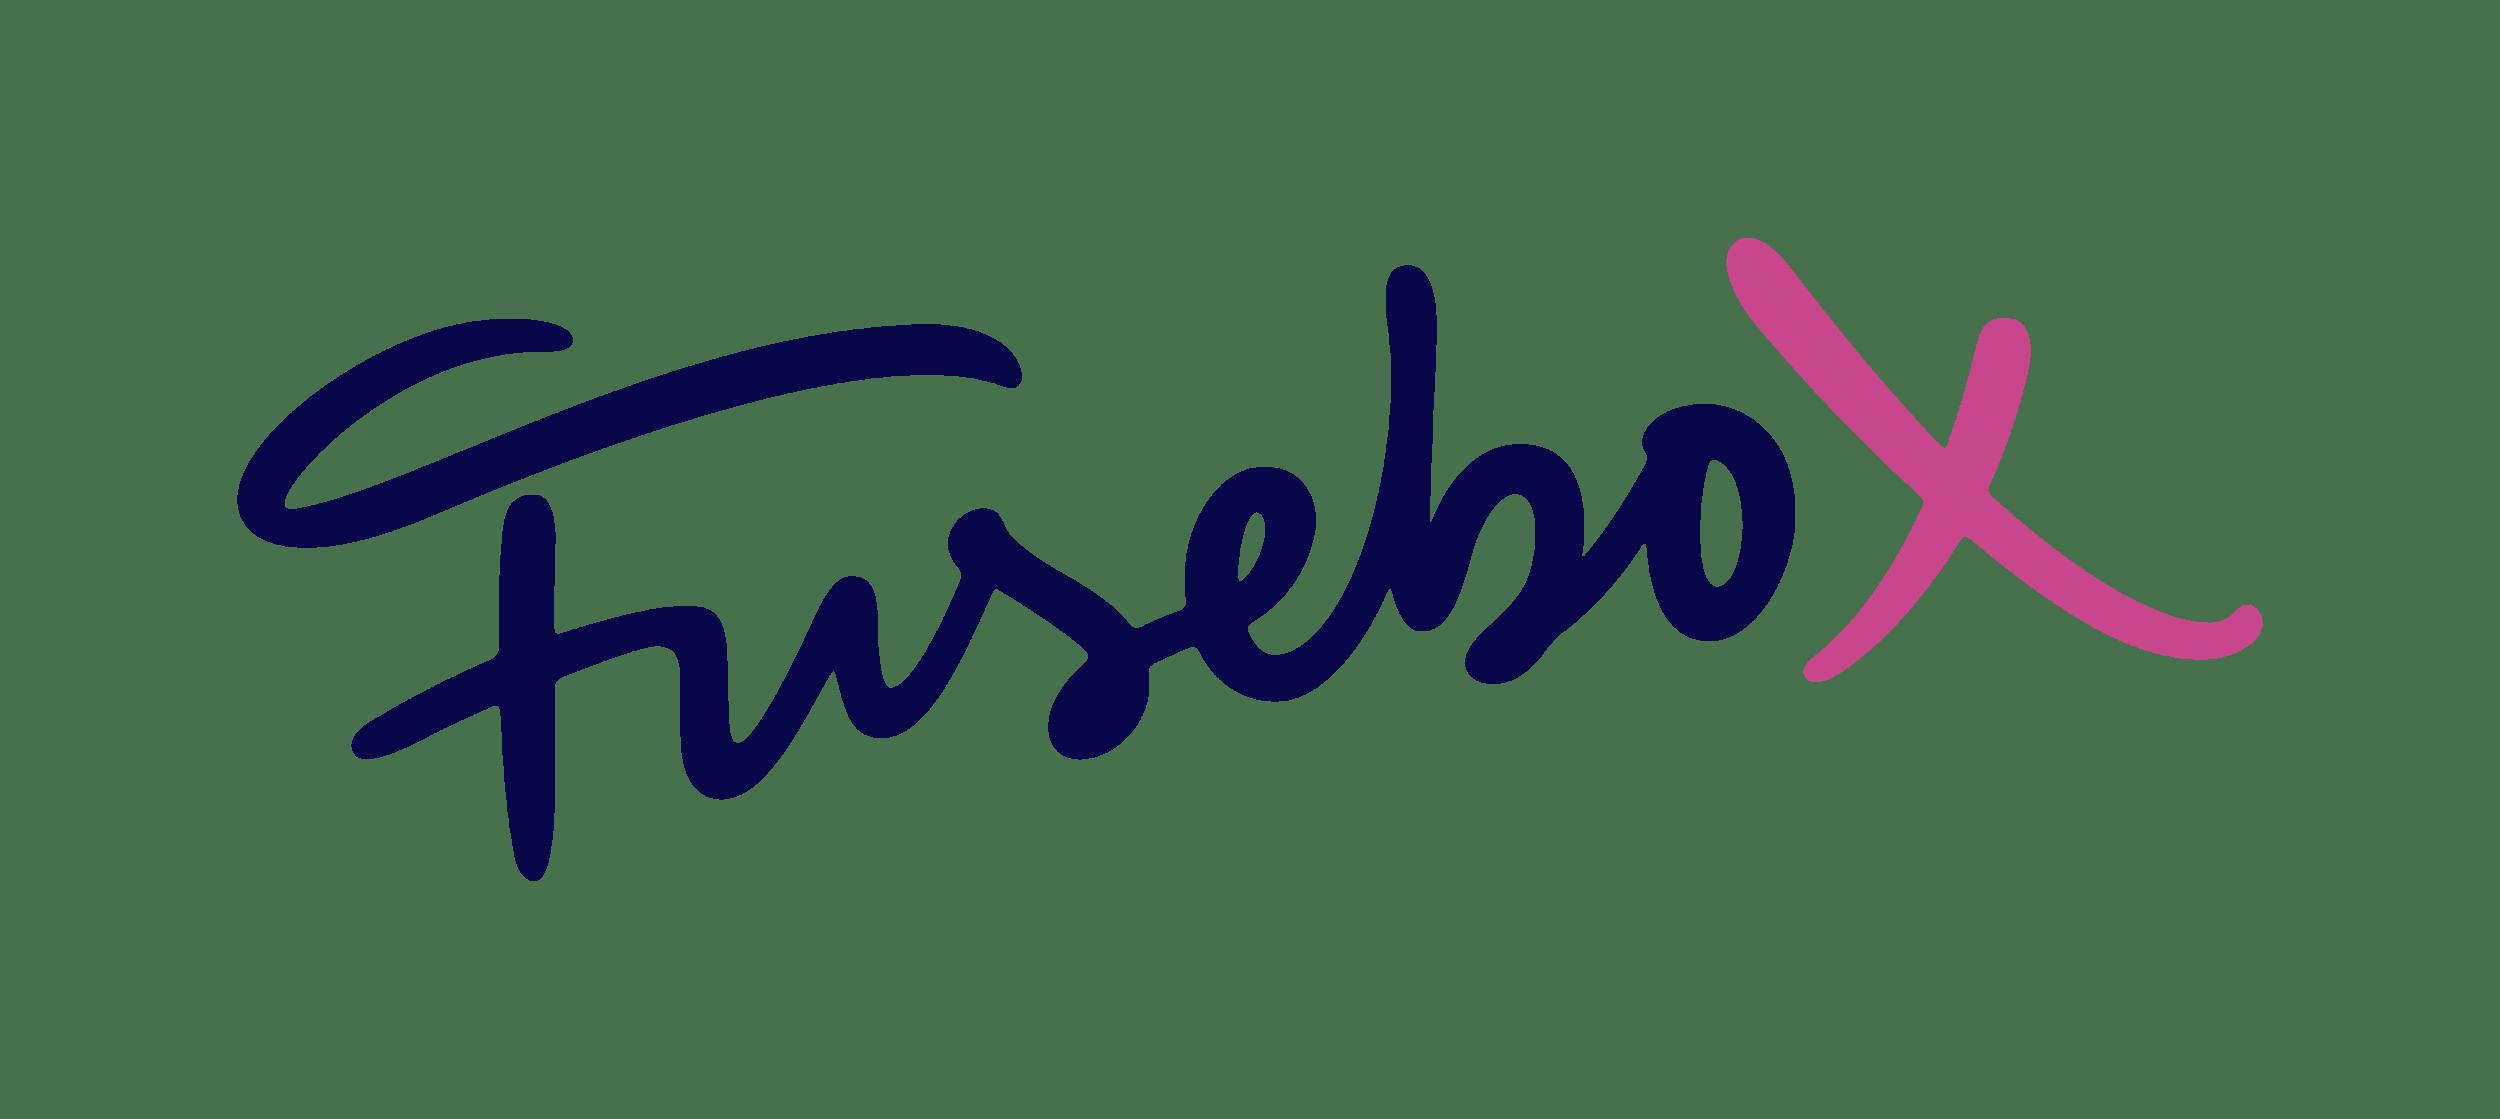 medium resolution of fuse box cartoon